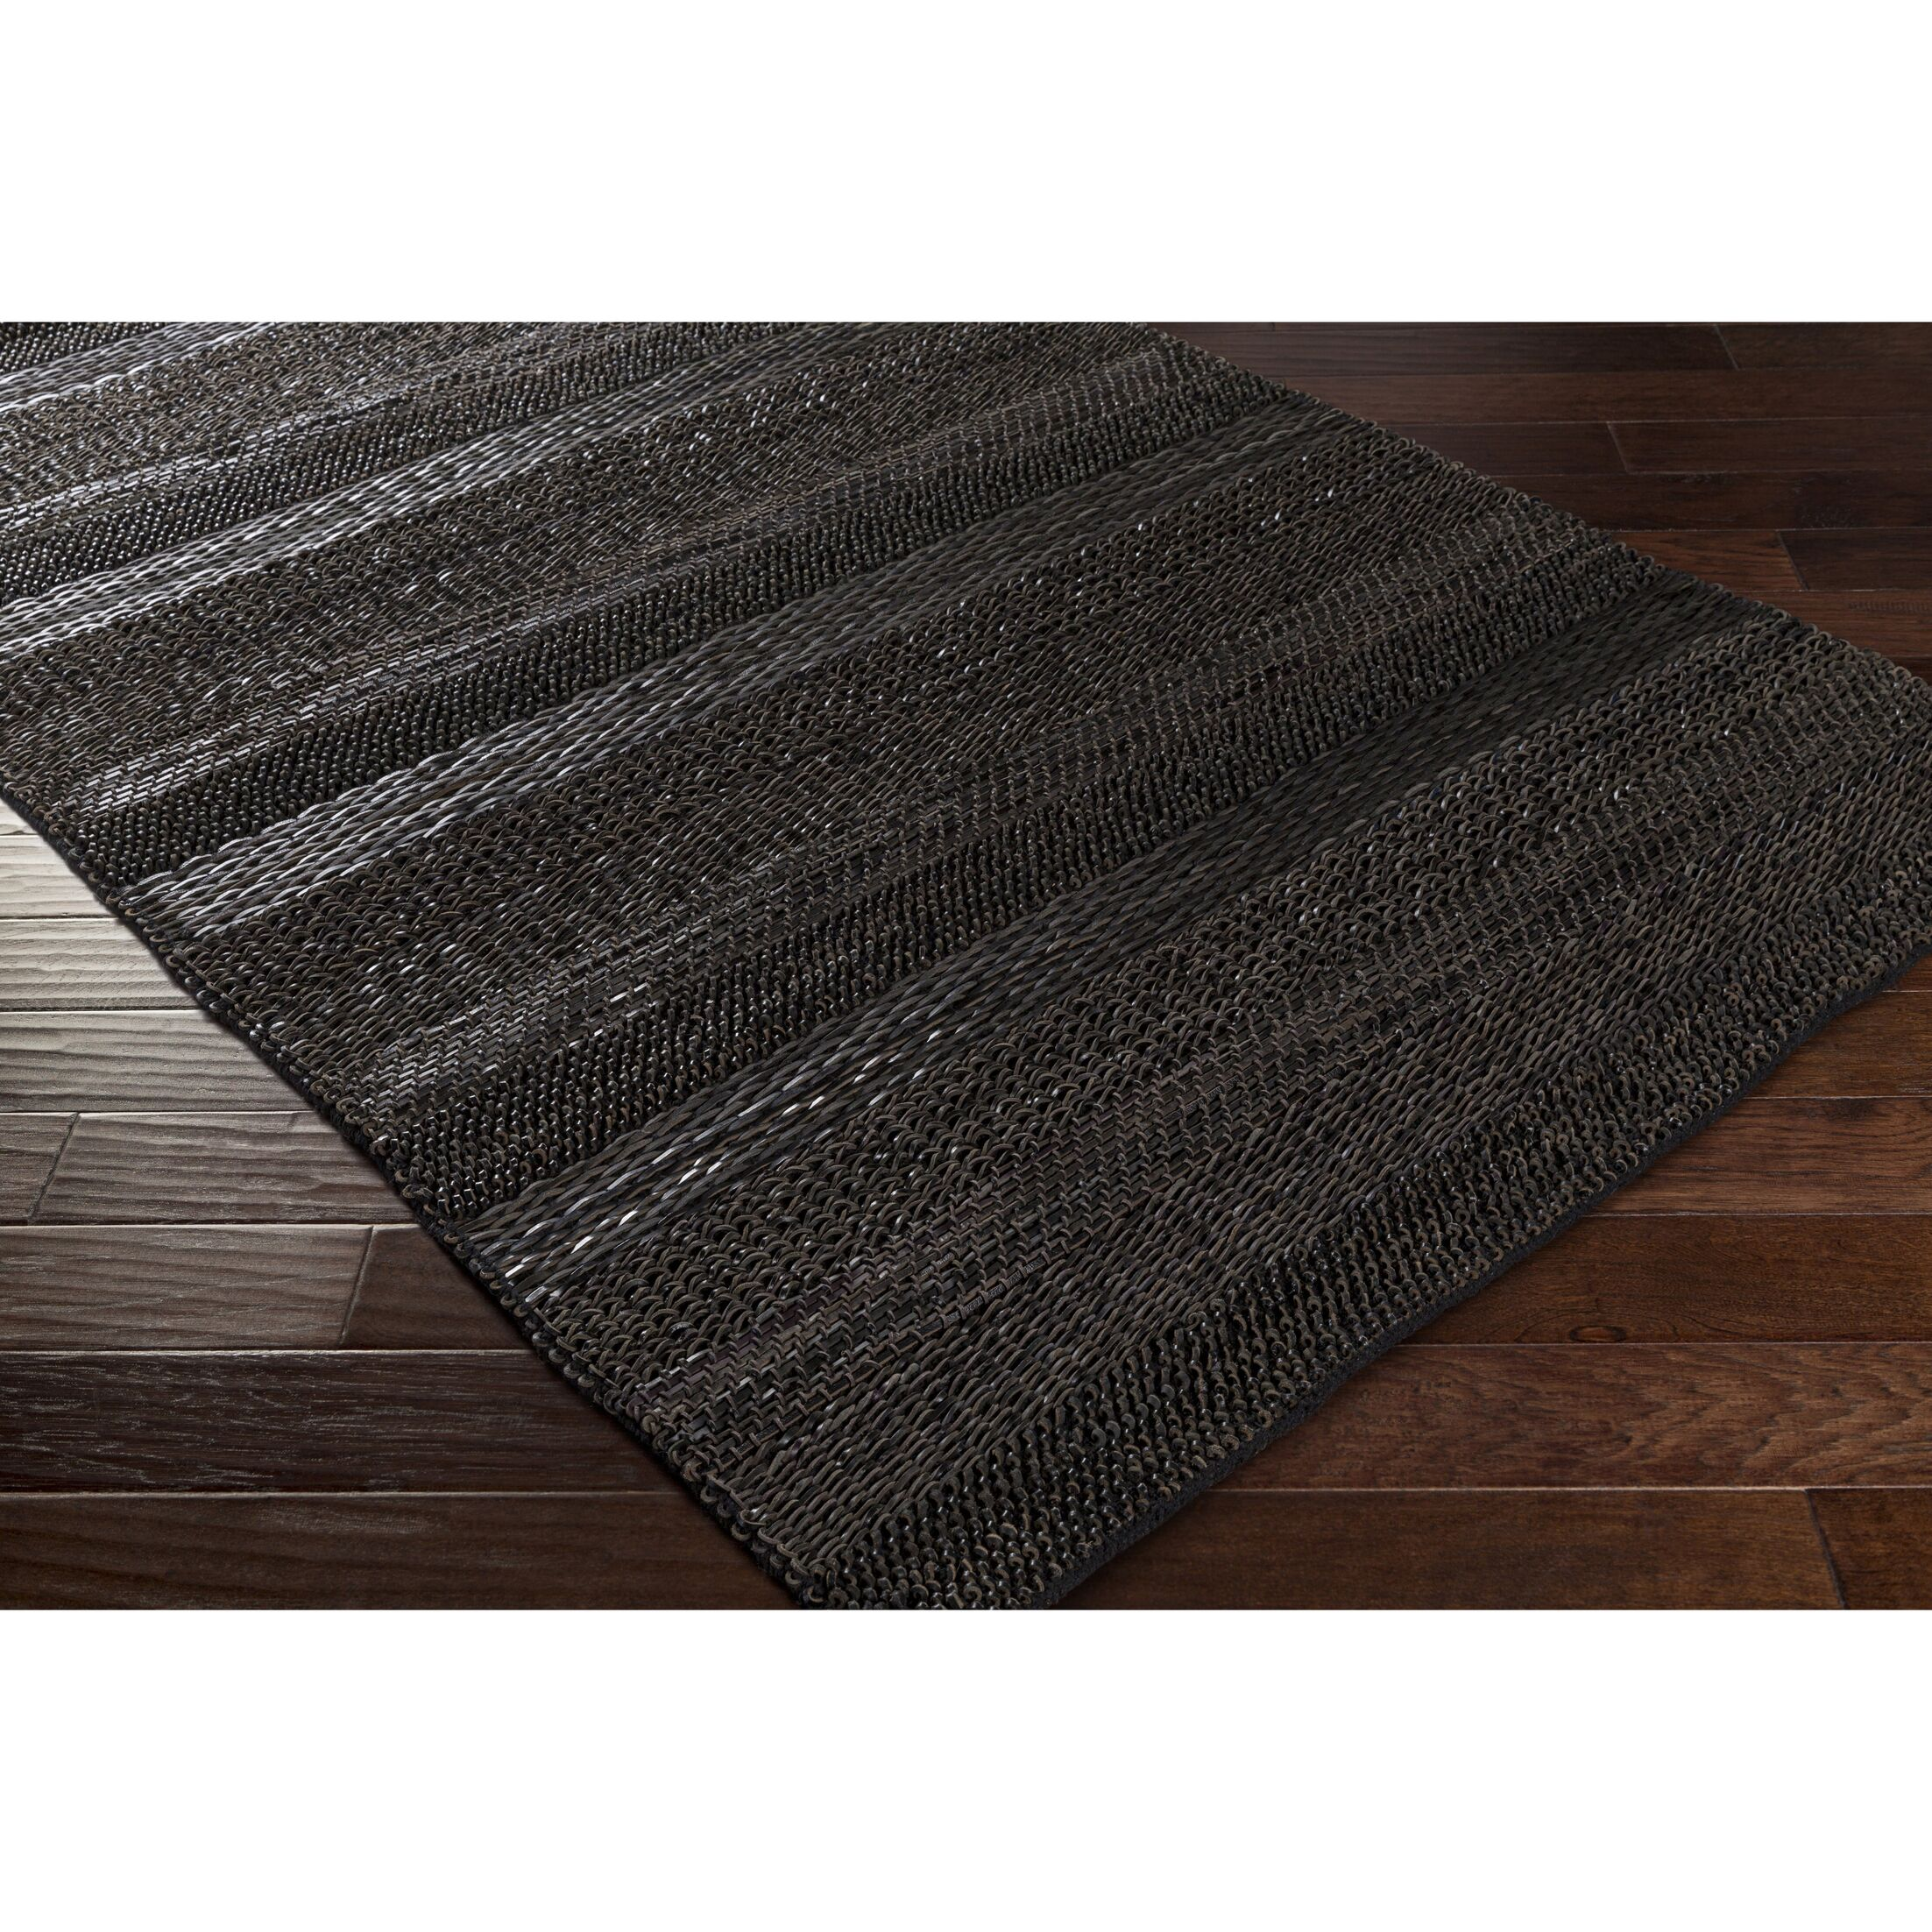 Bennett Hand-Woven Black Area Rug Rug Size: Rectangle 5' x 7'6